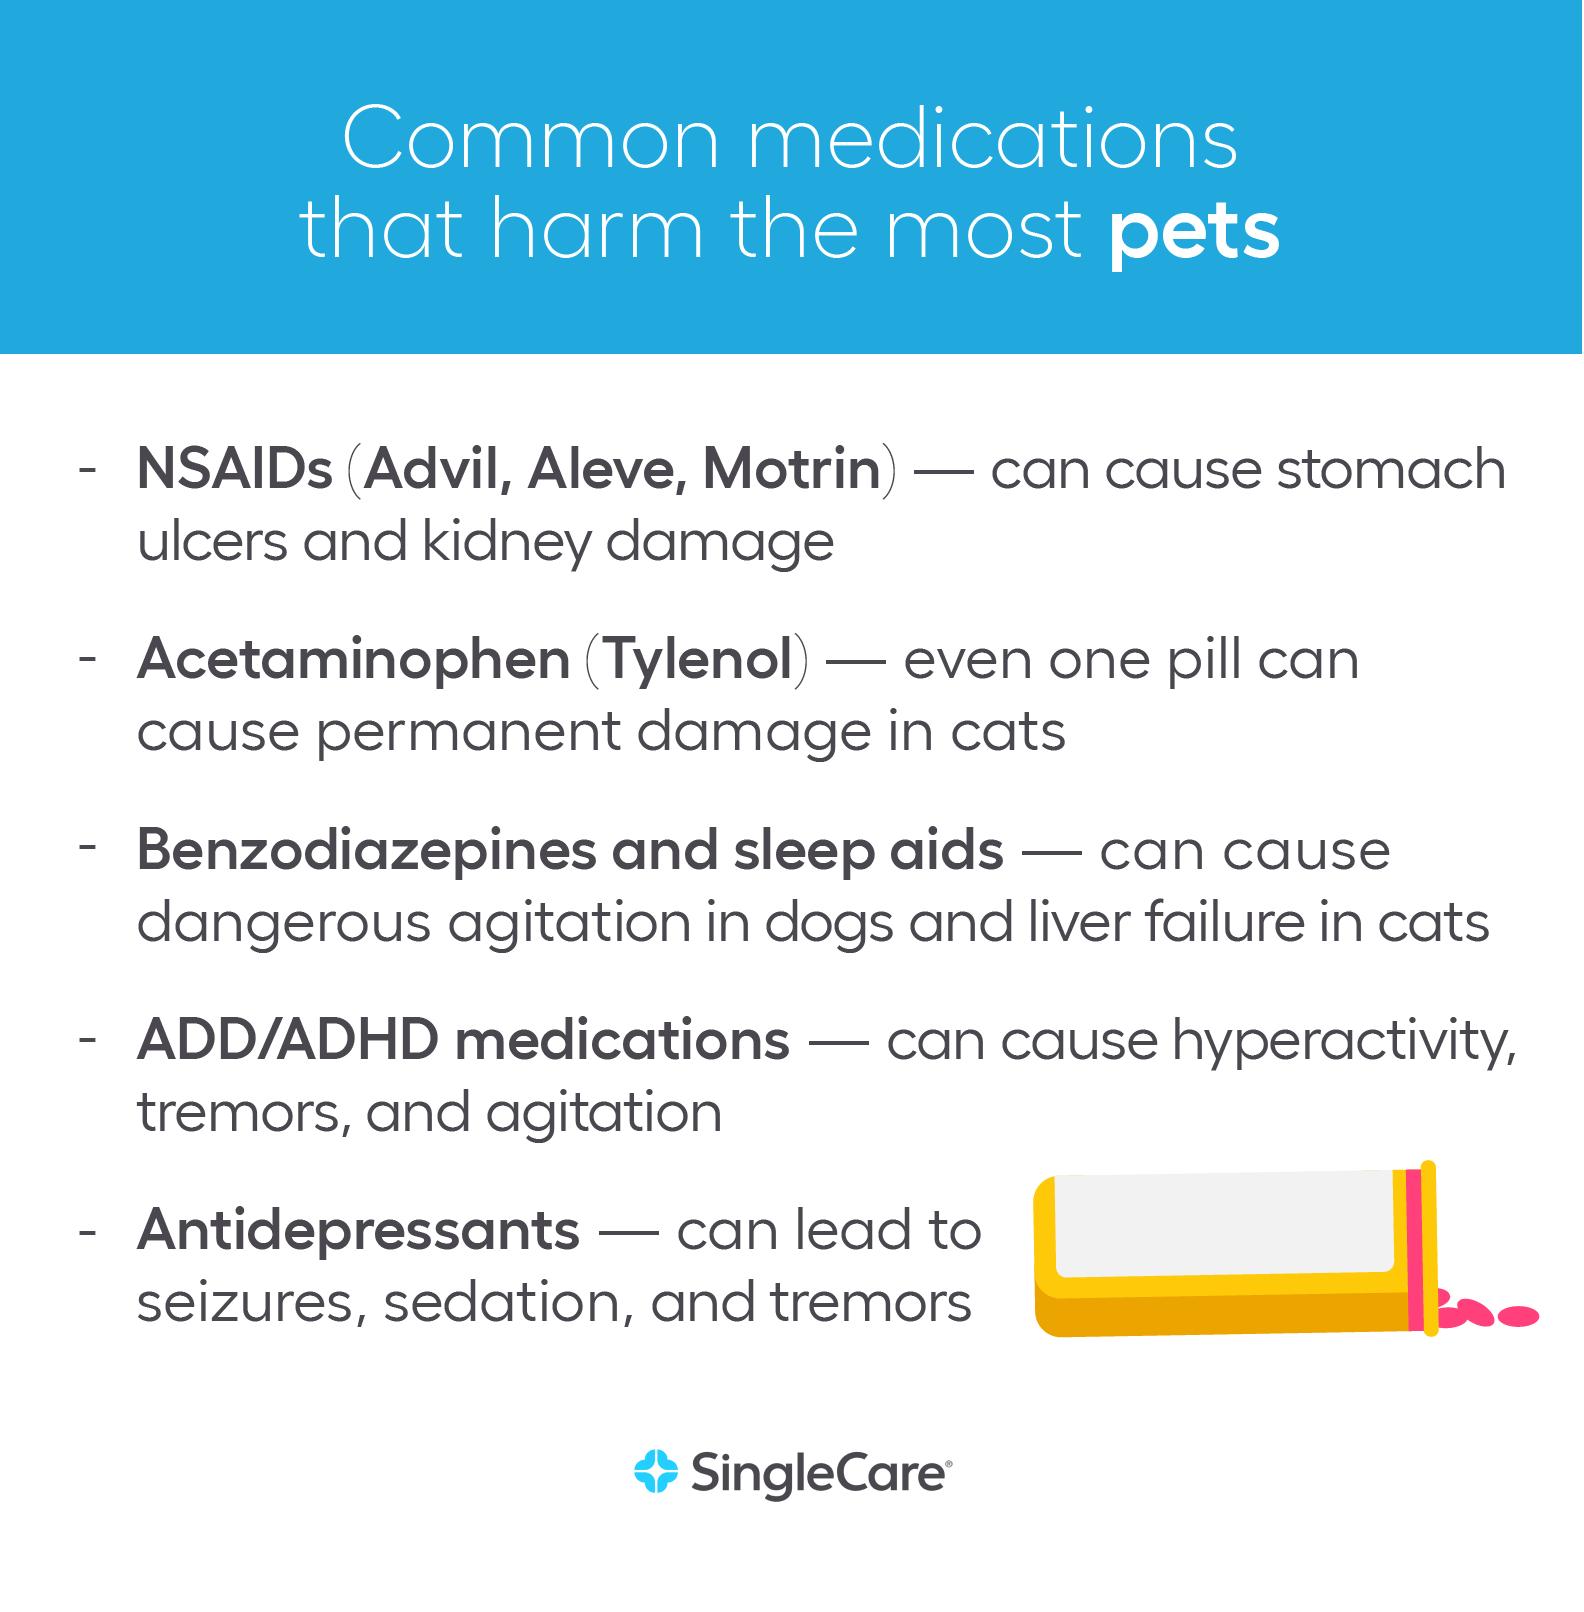 medications that harm pets list